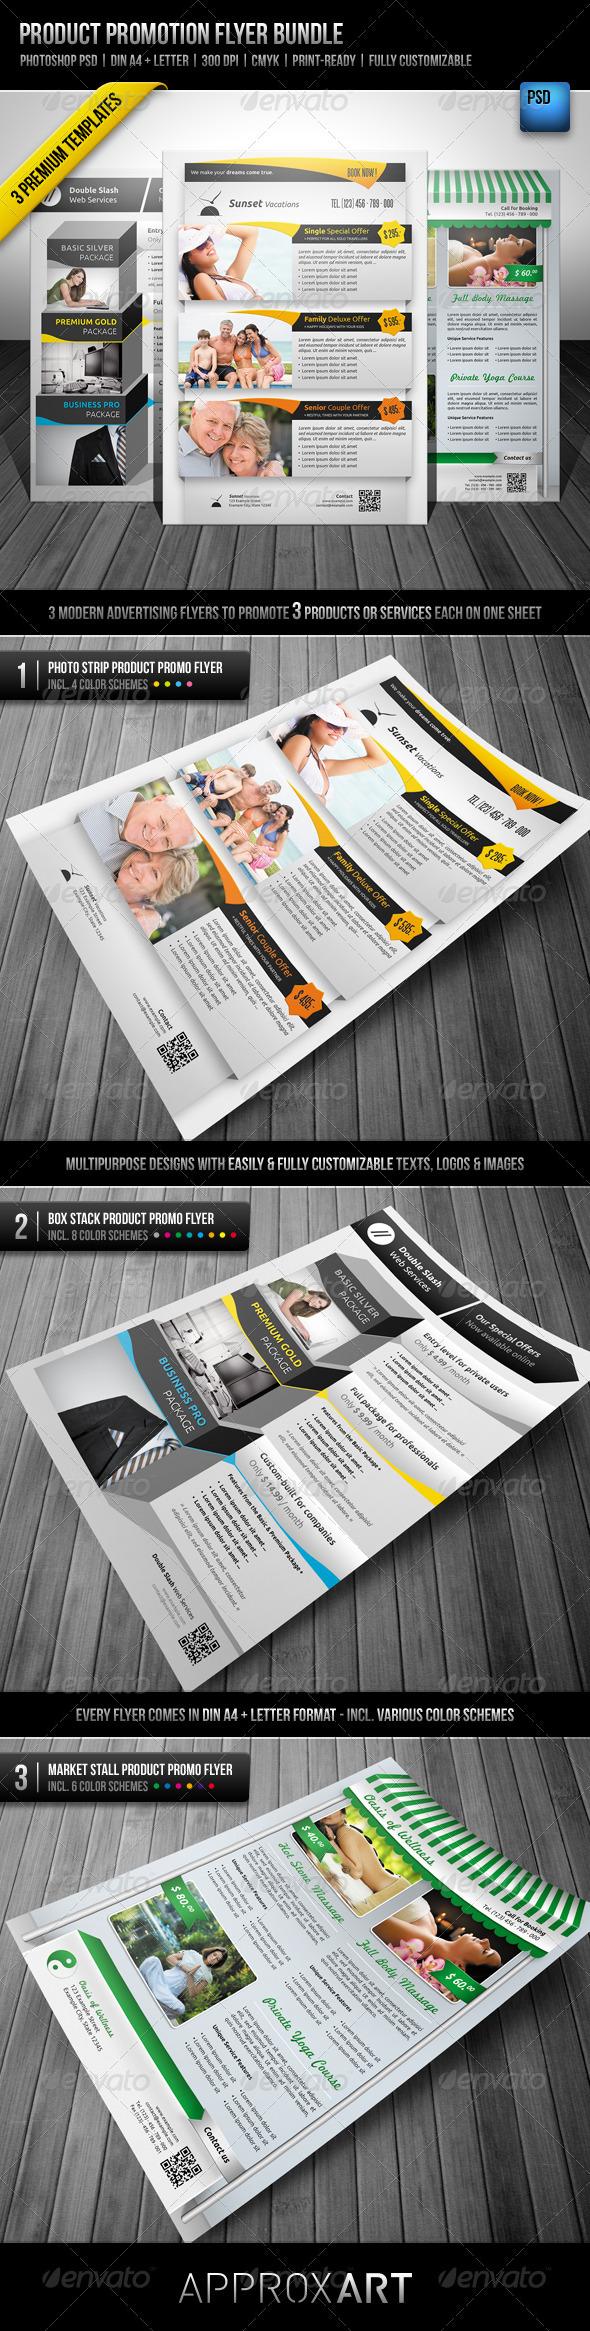 GraphicRiver Product Promotion Flyer Bundle 2444914